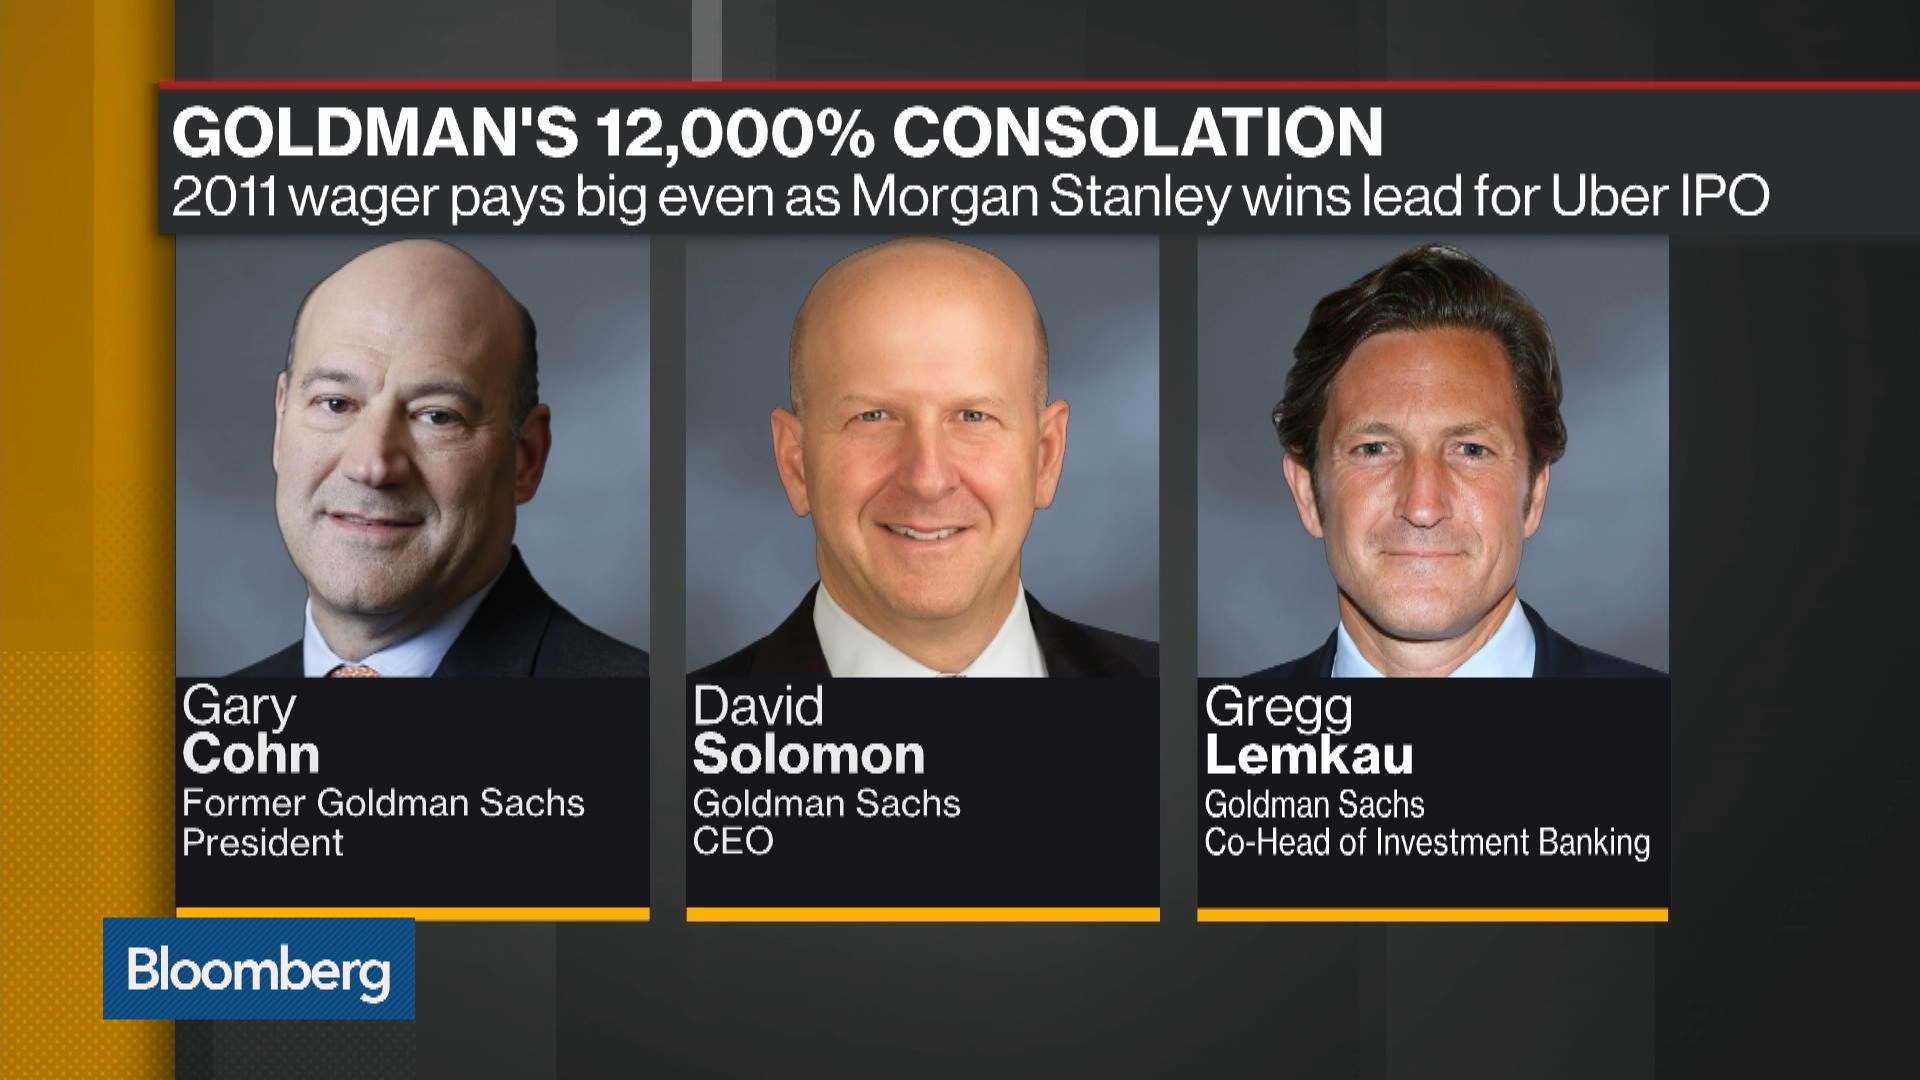 Goldman's 12,000% Consolation Prize